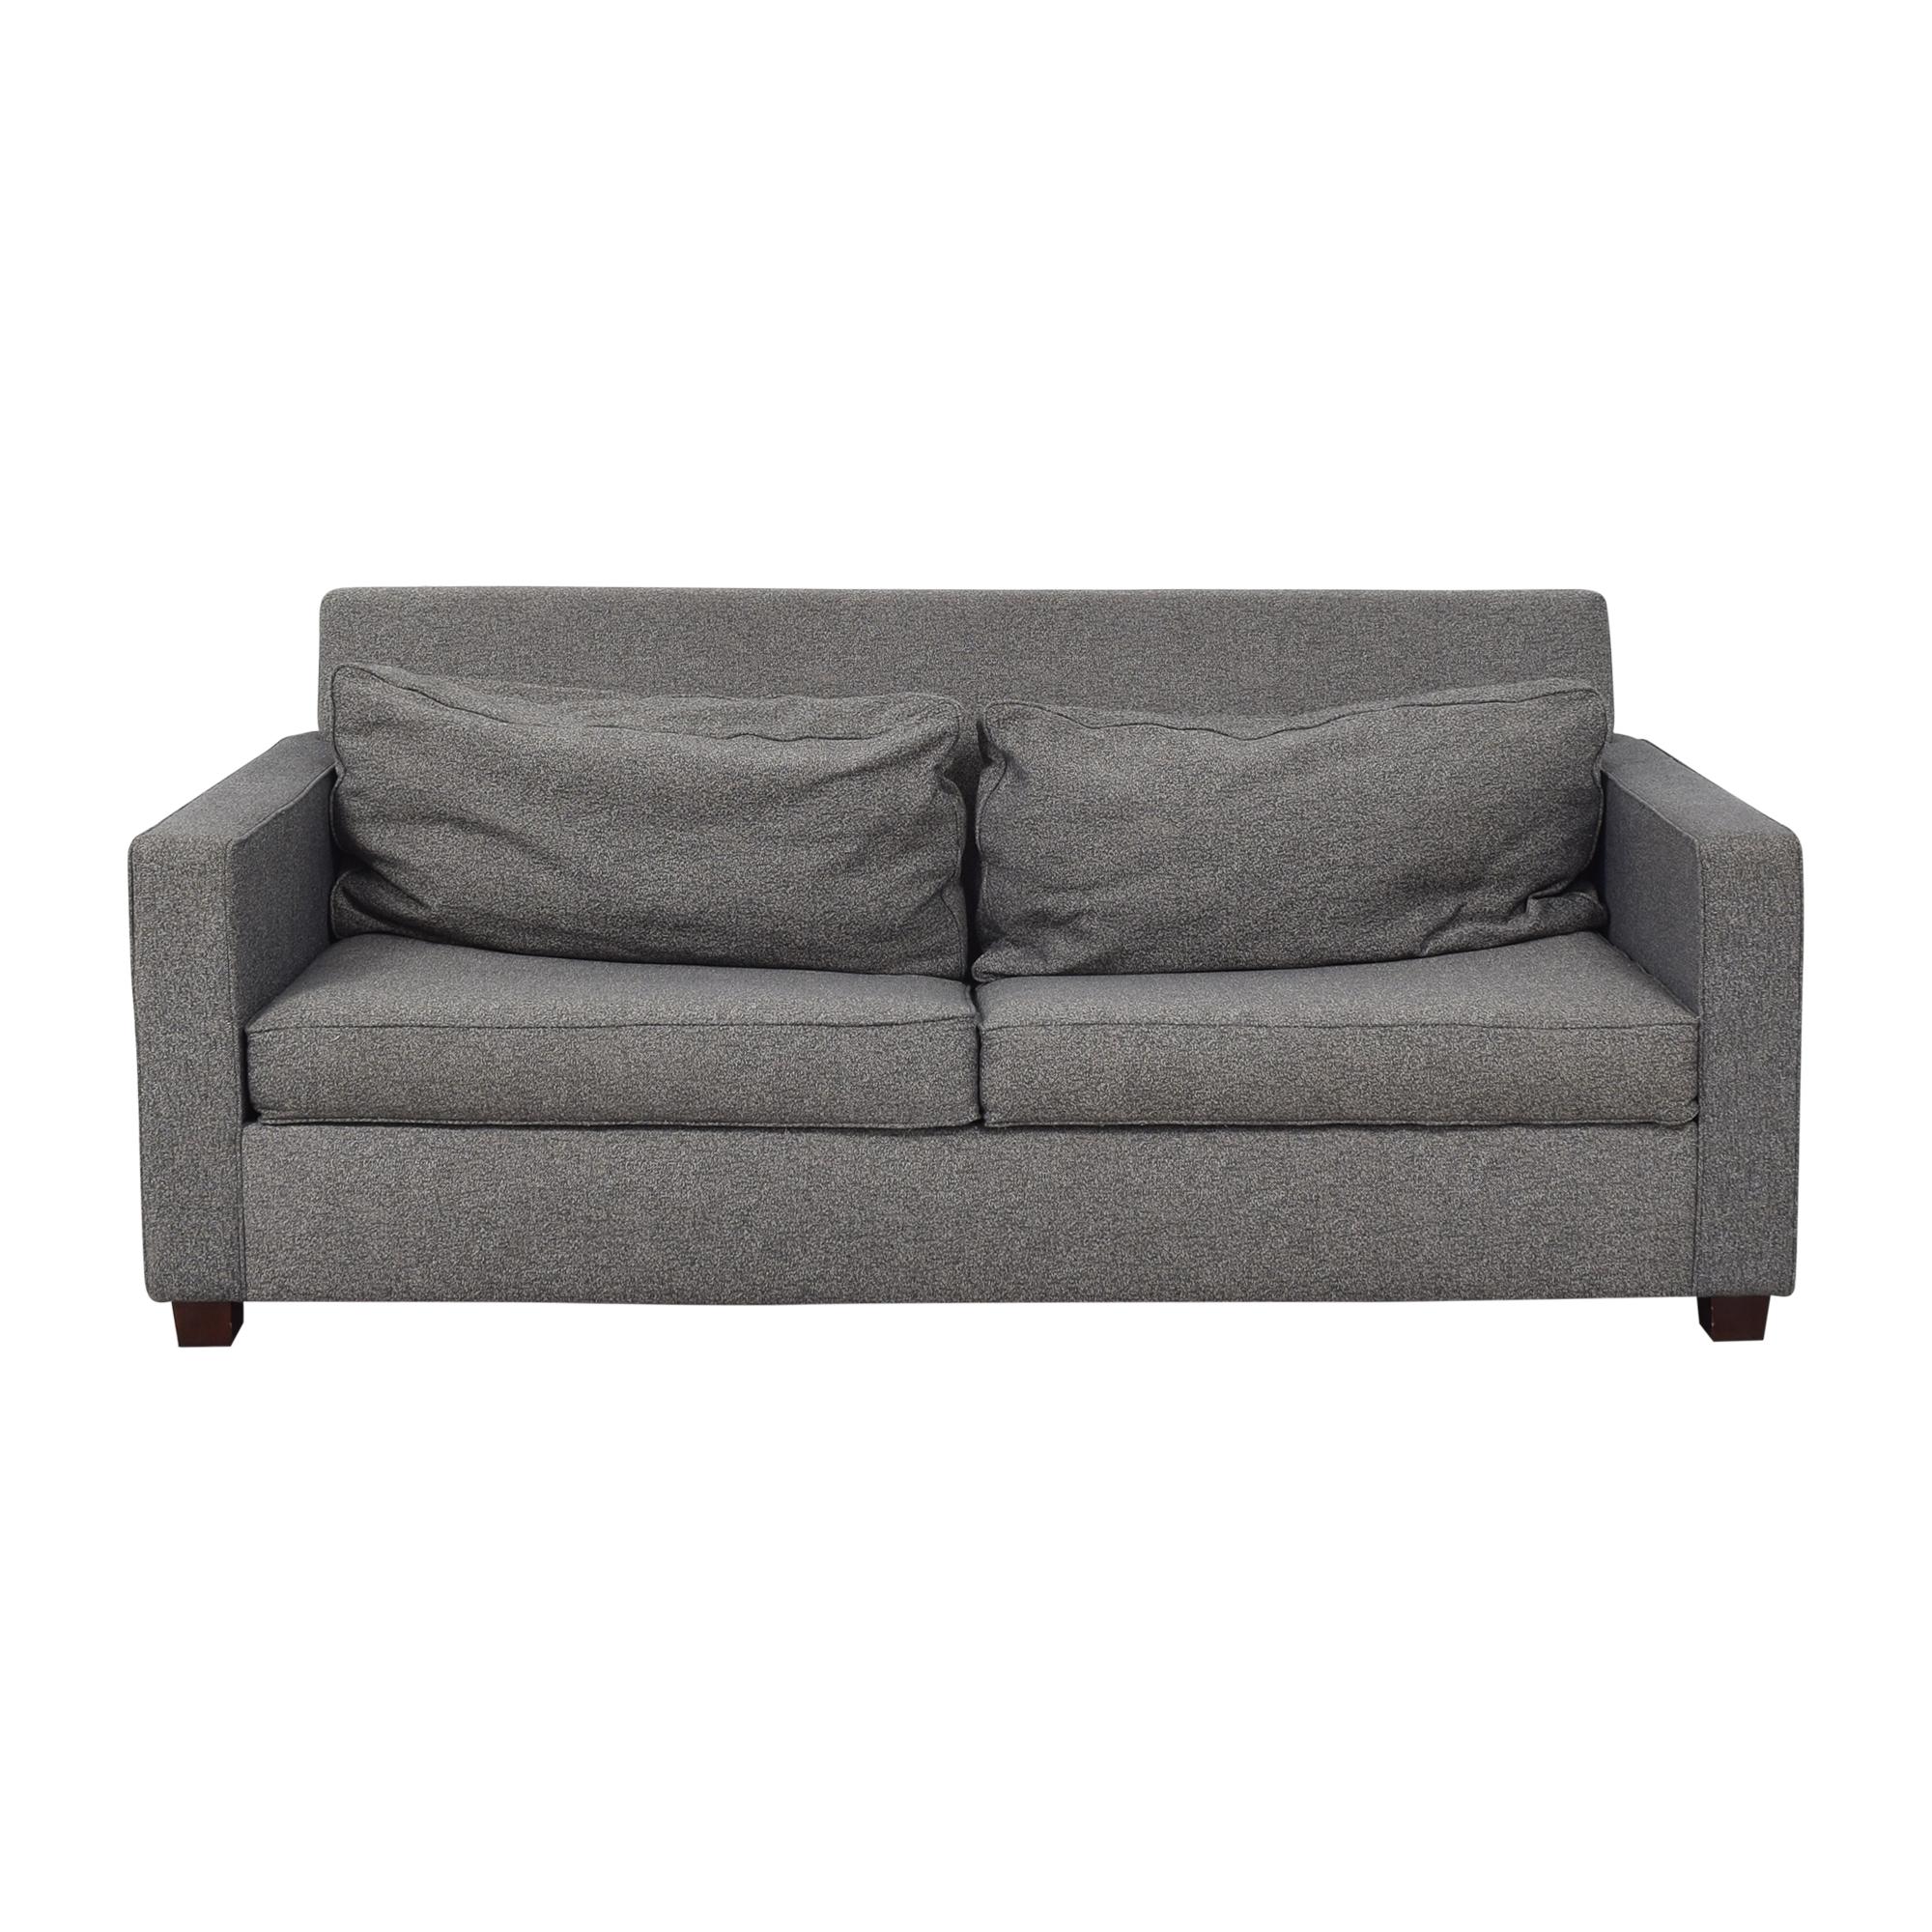 West Elm West Elm Henry Basic Sleeper Sofa second hand